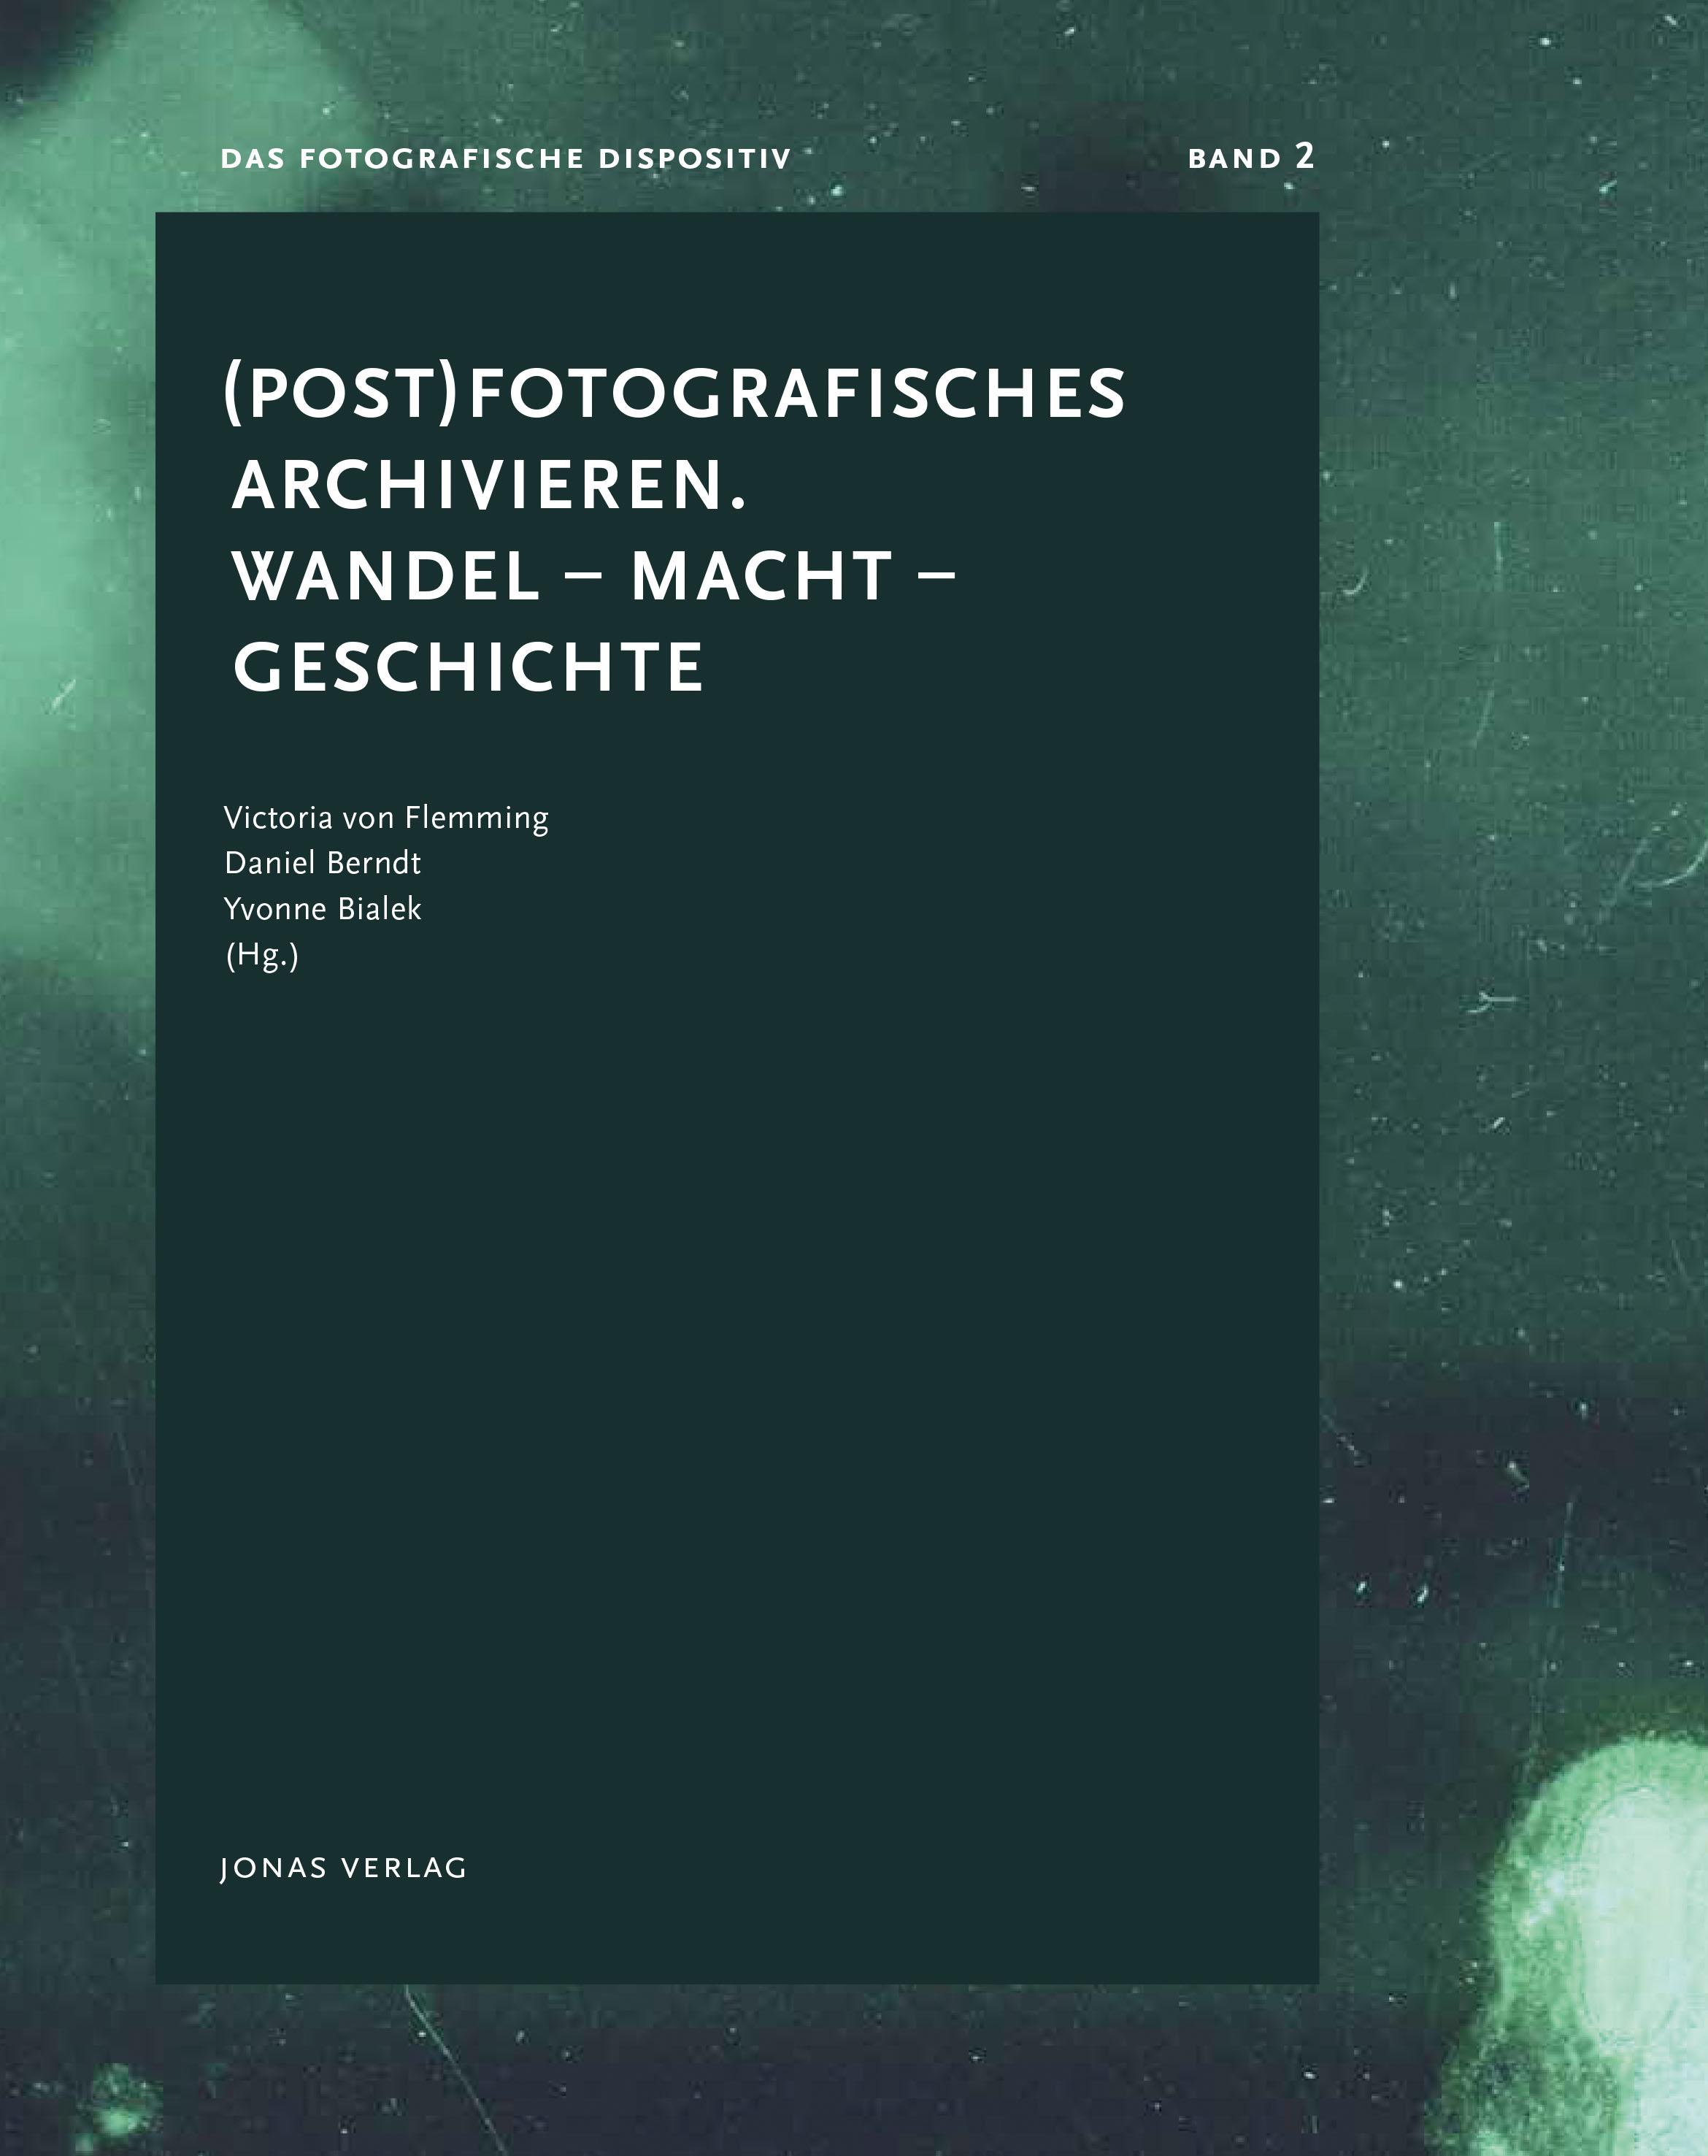 (Post) Fotografisches archivieren. Wandel - Macht - Geschichte